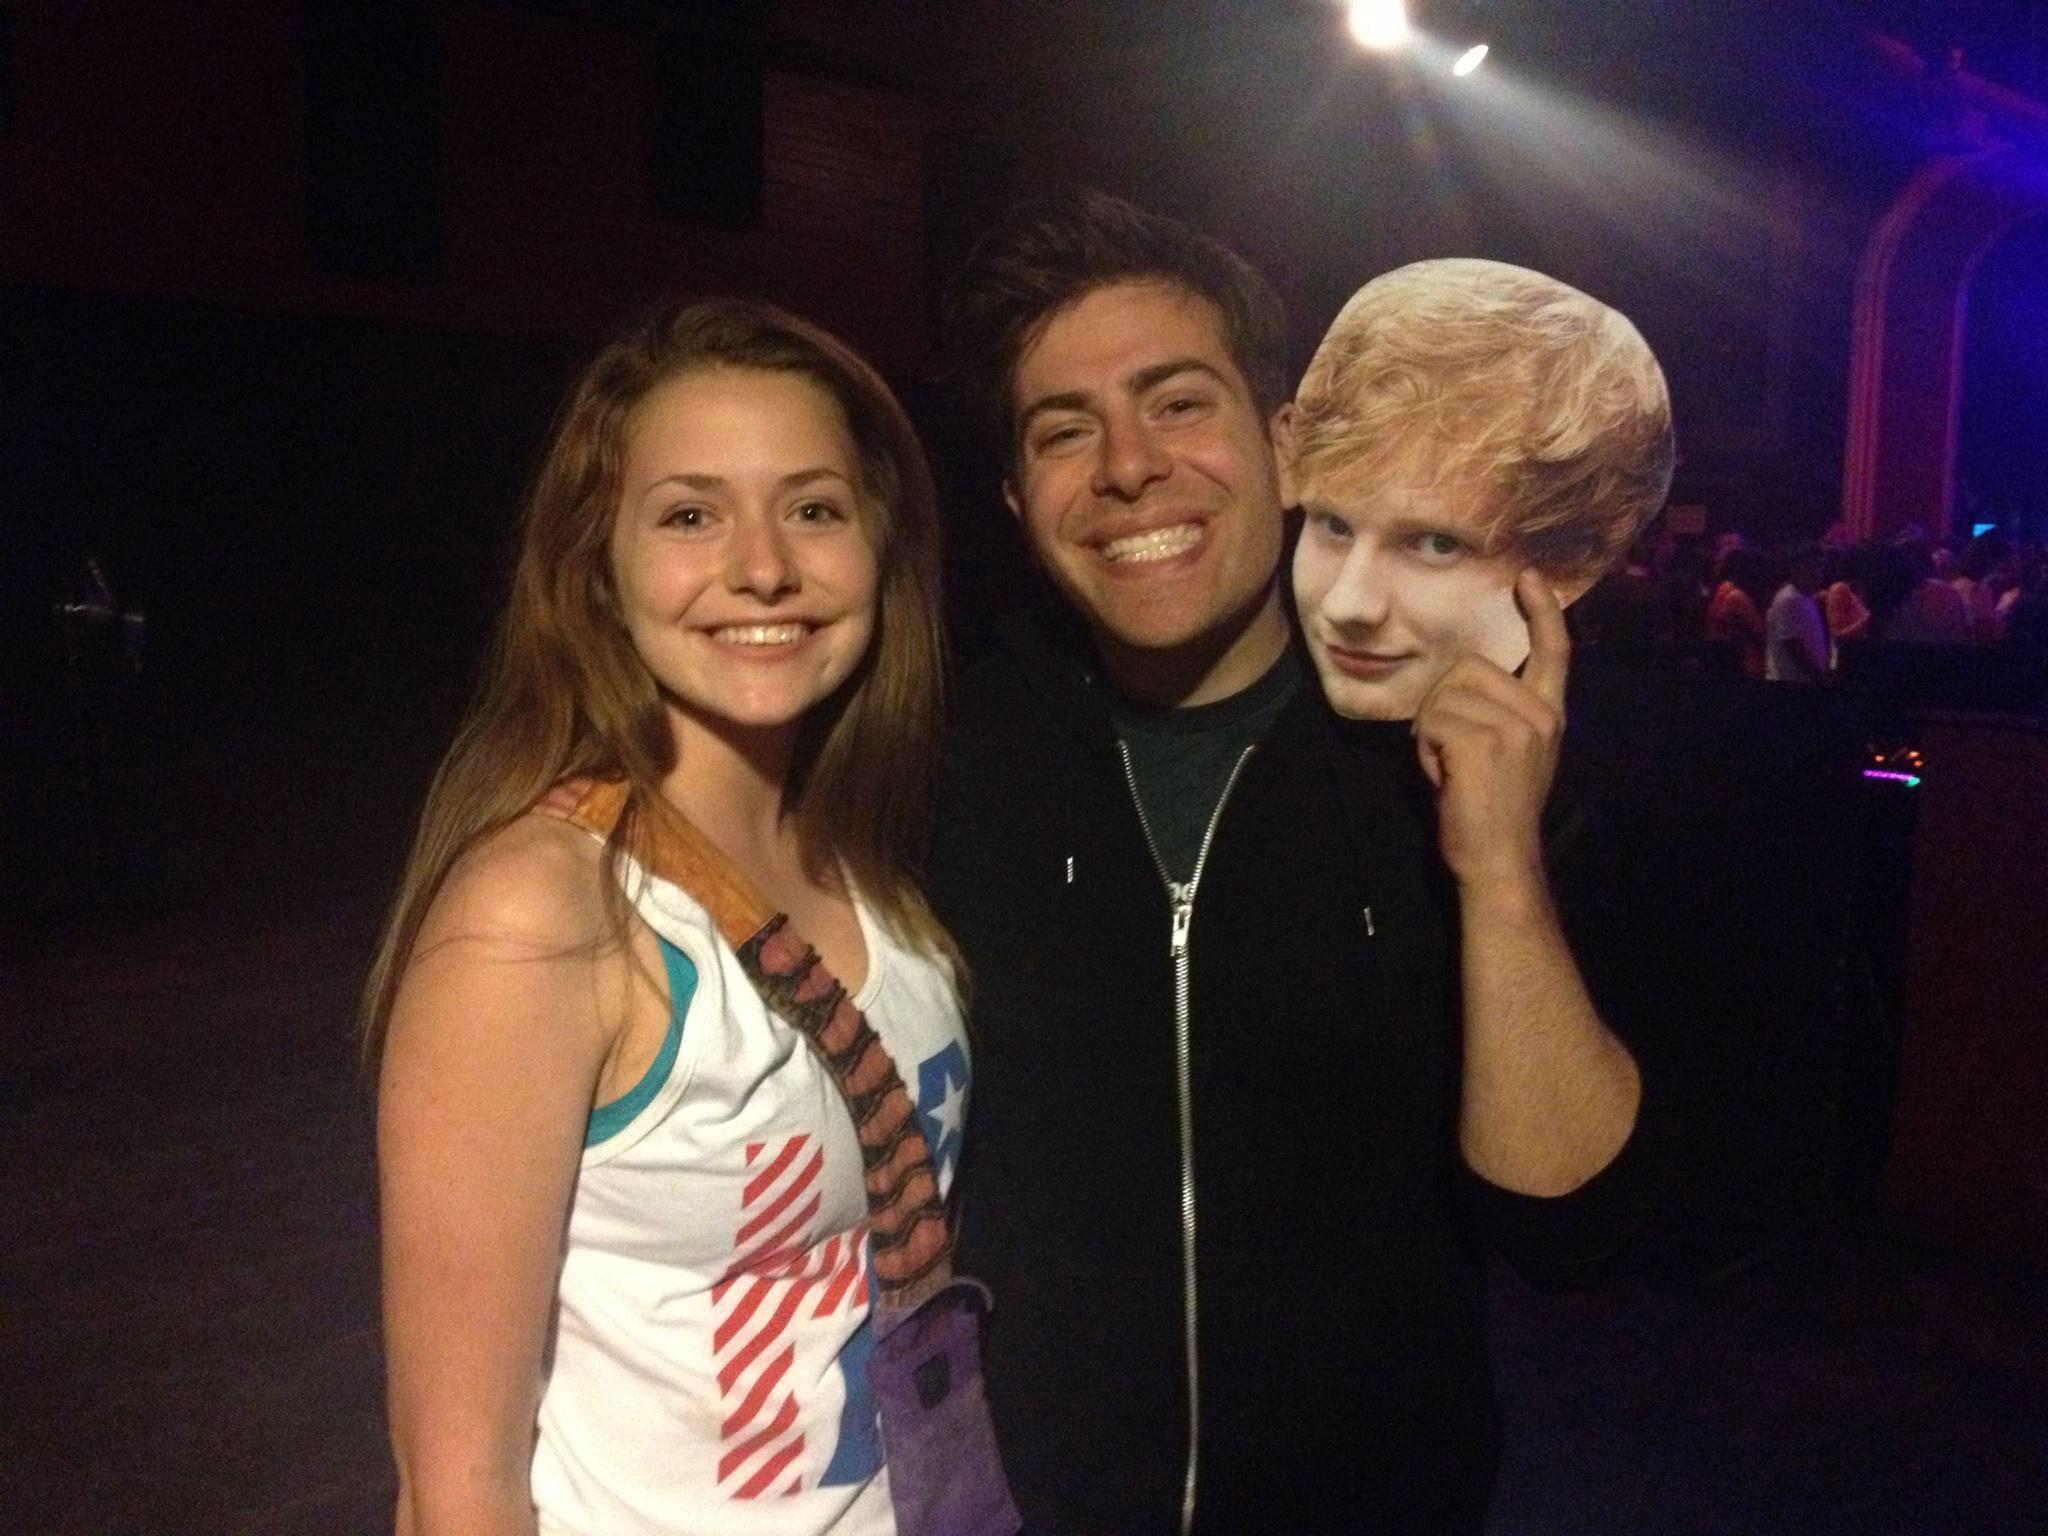 Fan With Hoodie Allen And Ed Sheeran Hoodies Concert Meet And